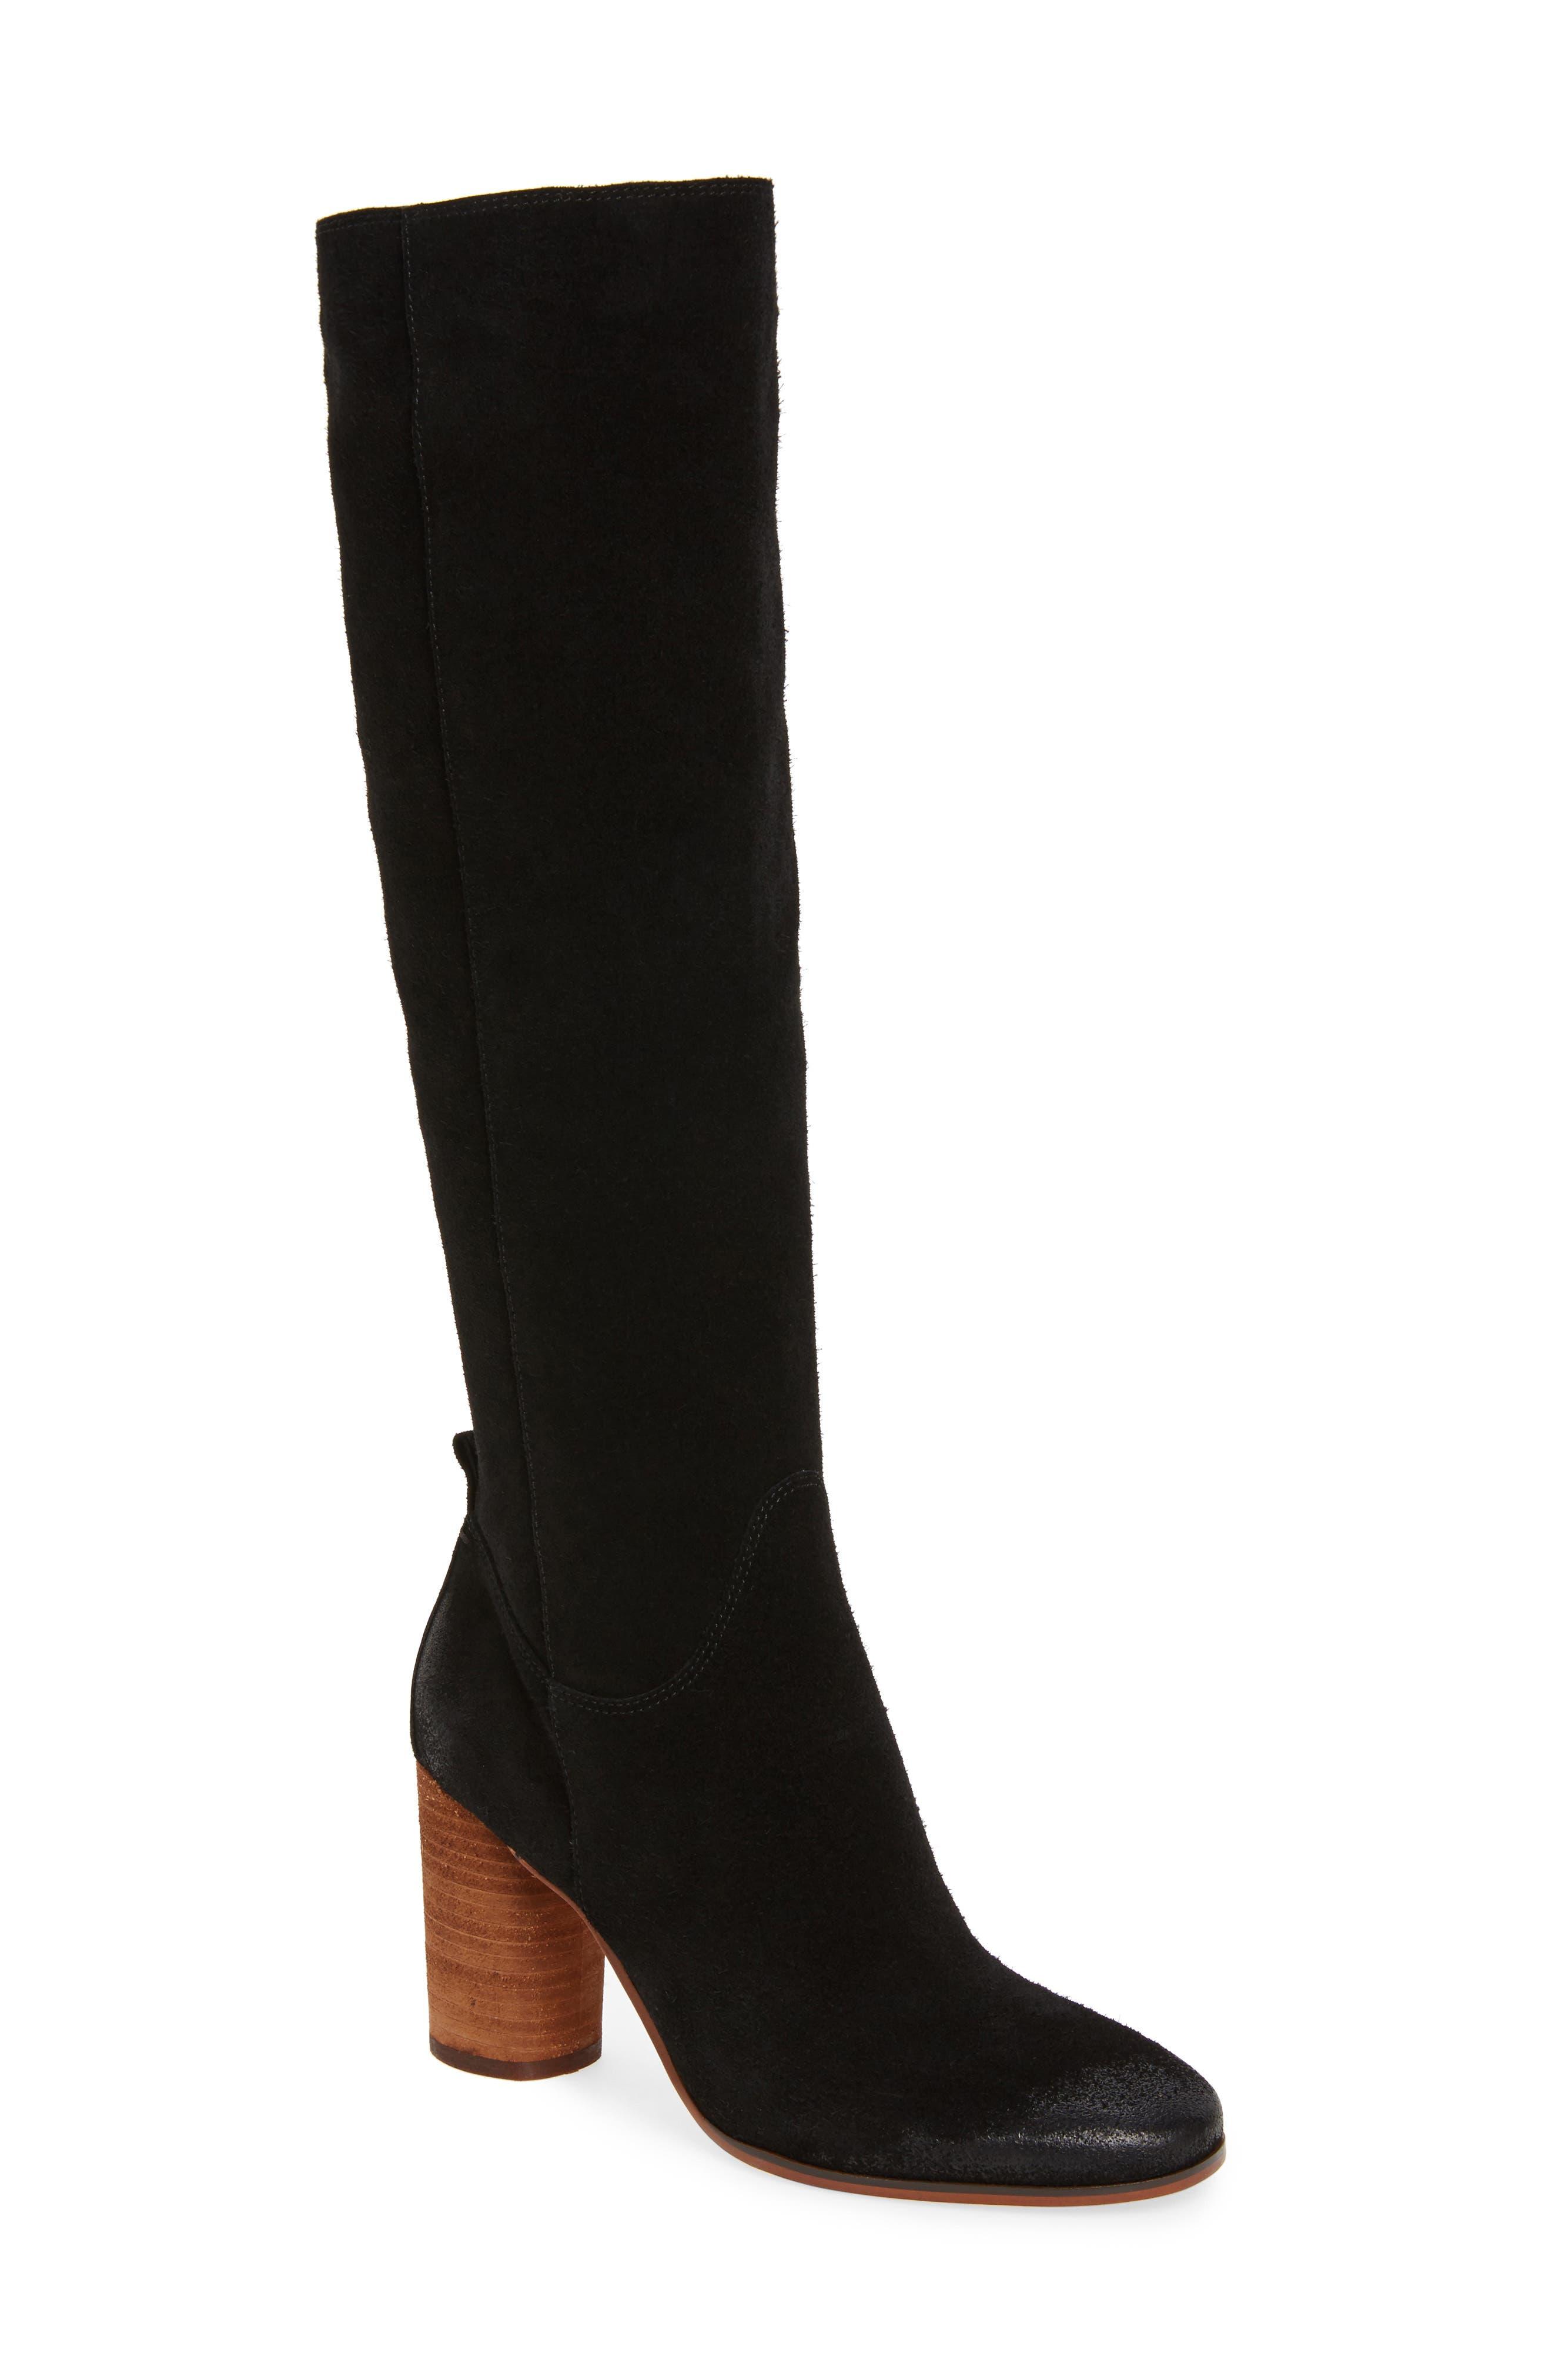 SAM EDELMAN Camellia Tall Boot, Main, color, 002